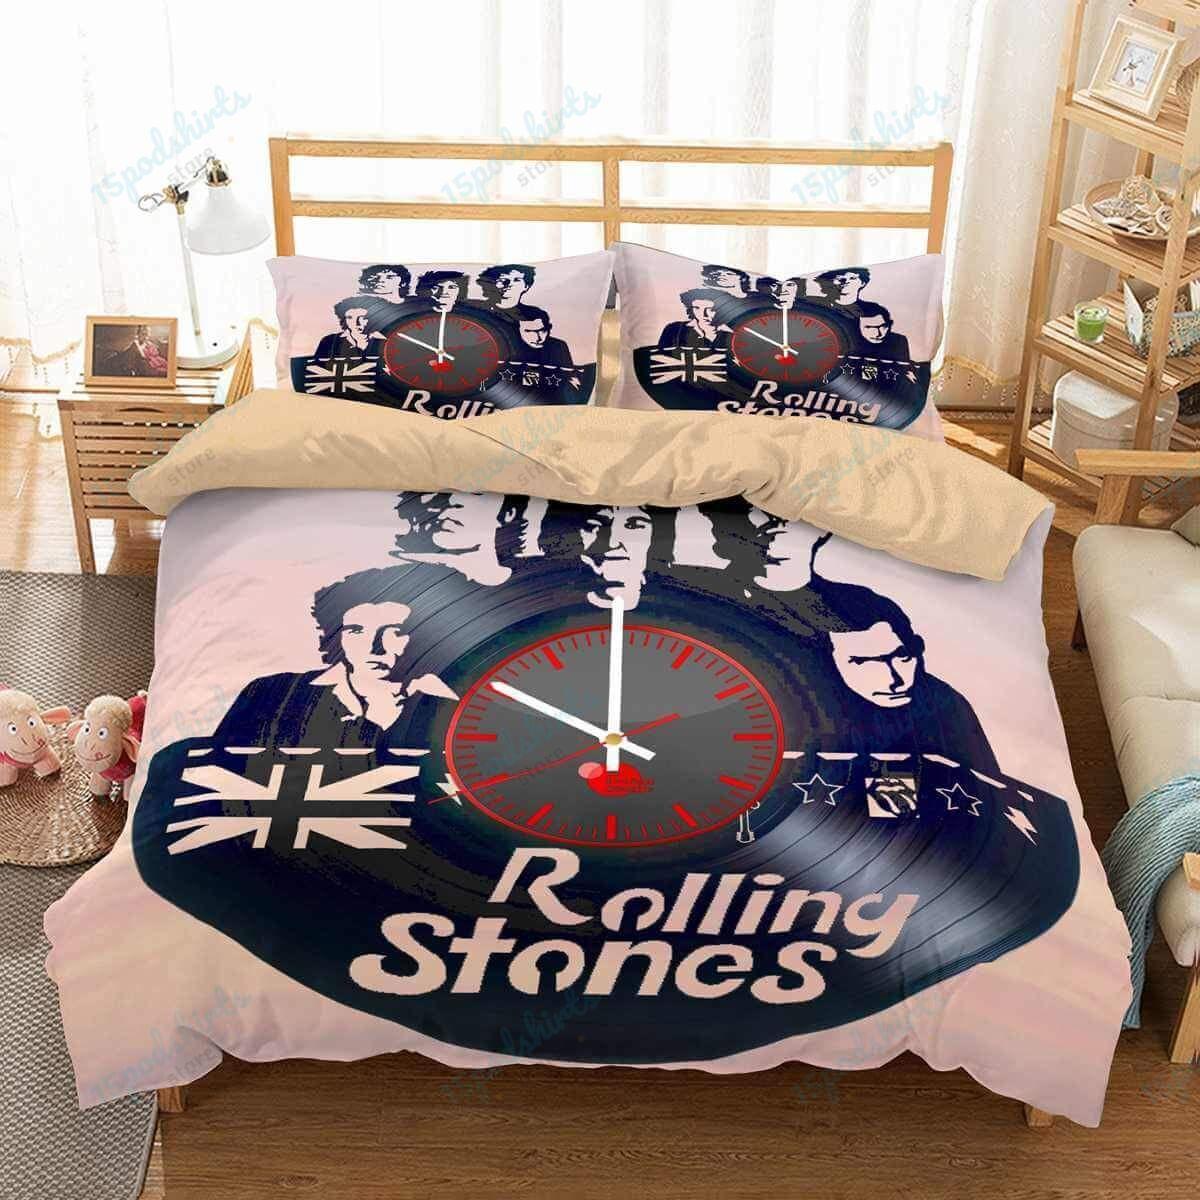 The Rolling Stones 1 Duvet Cover Bedding Set